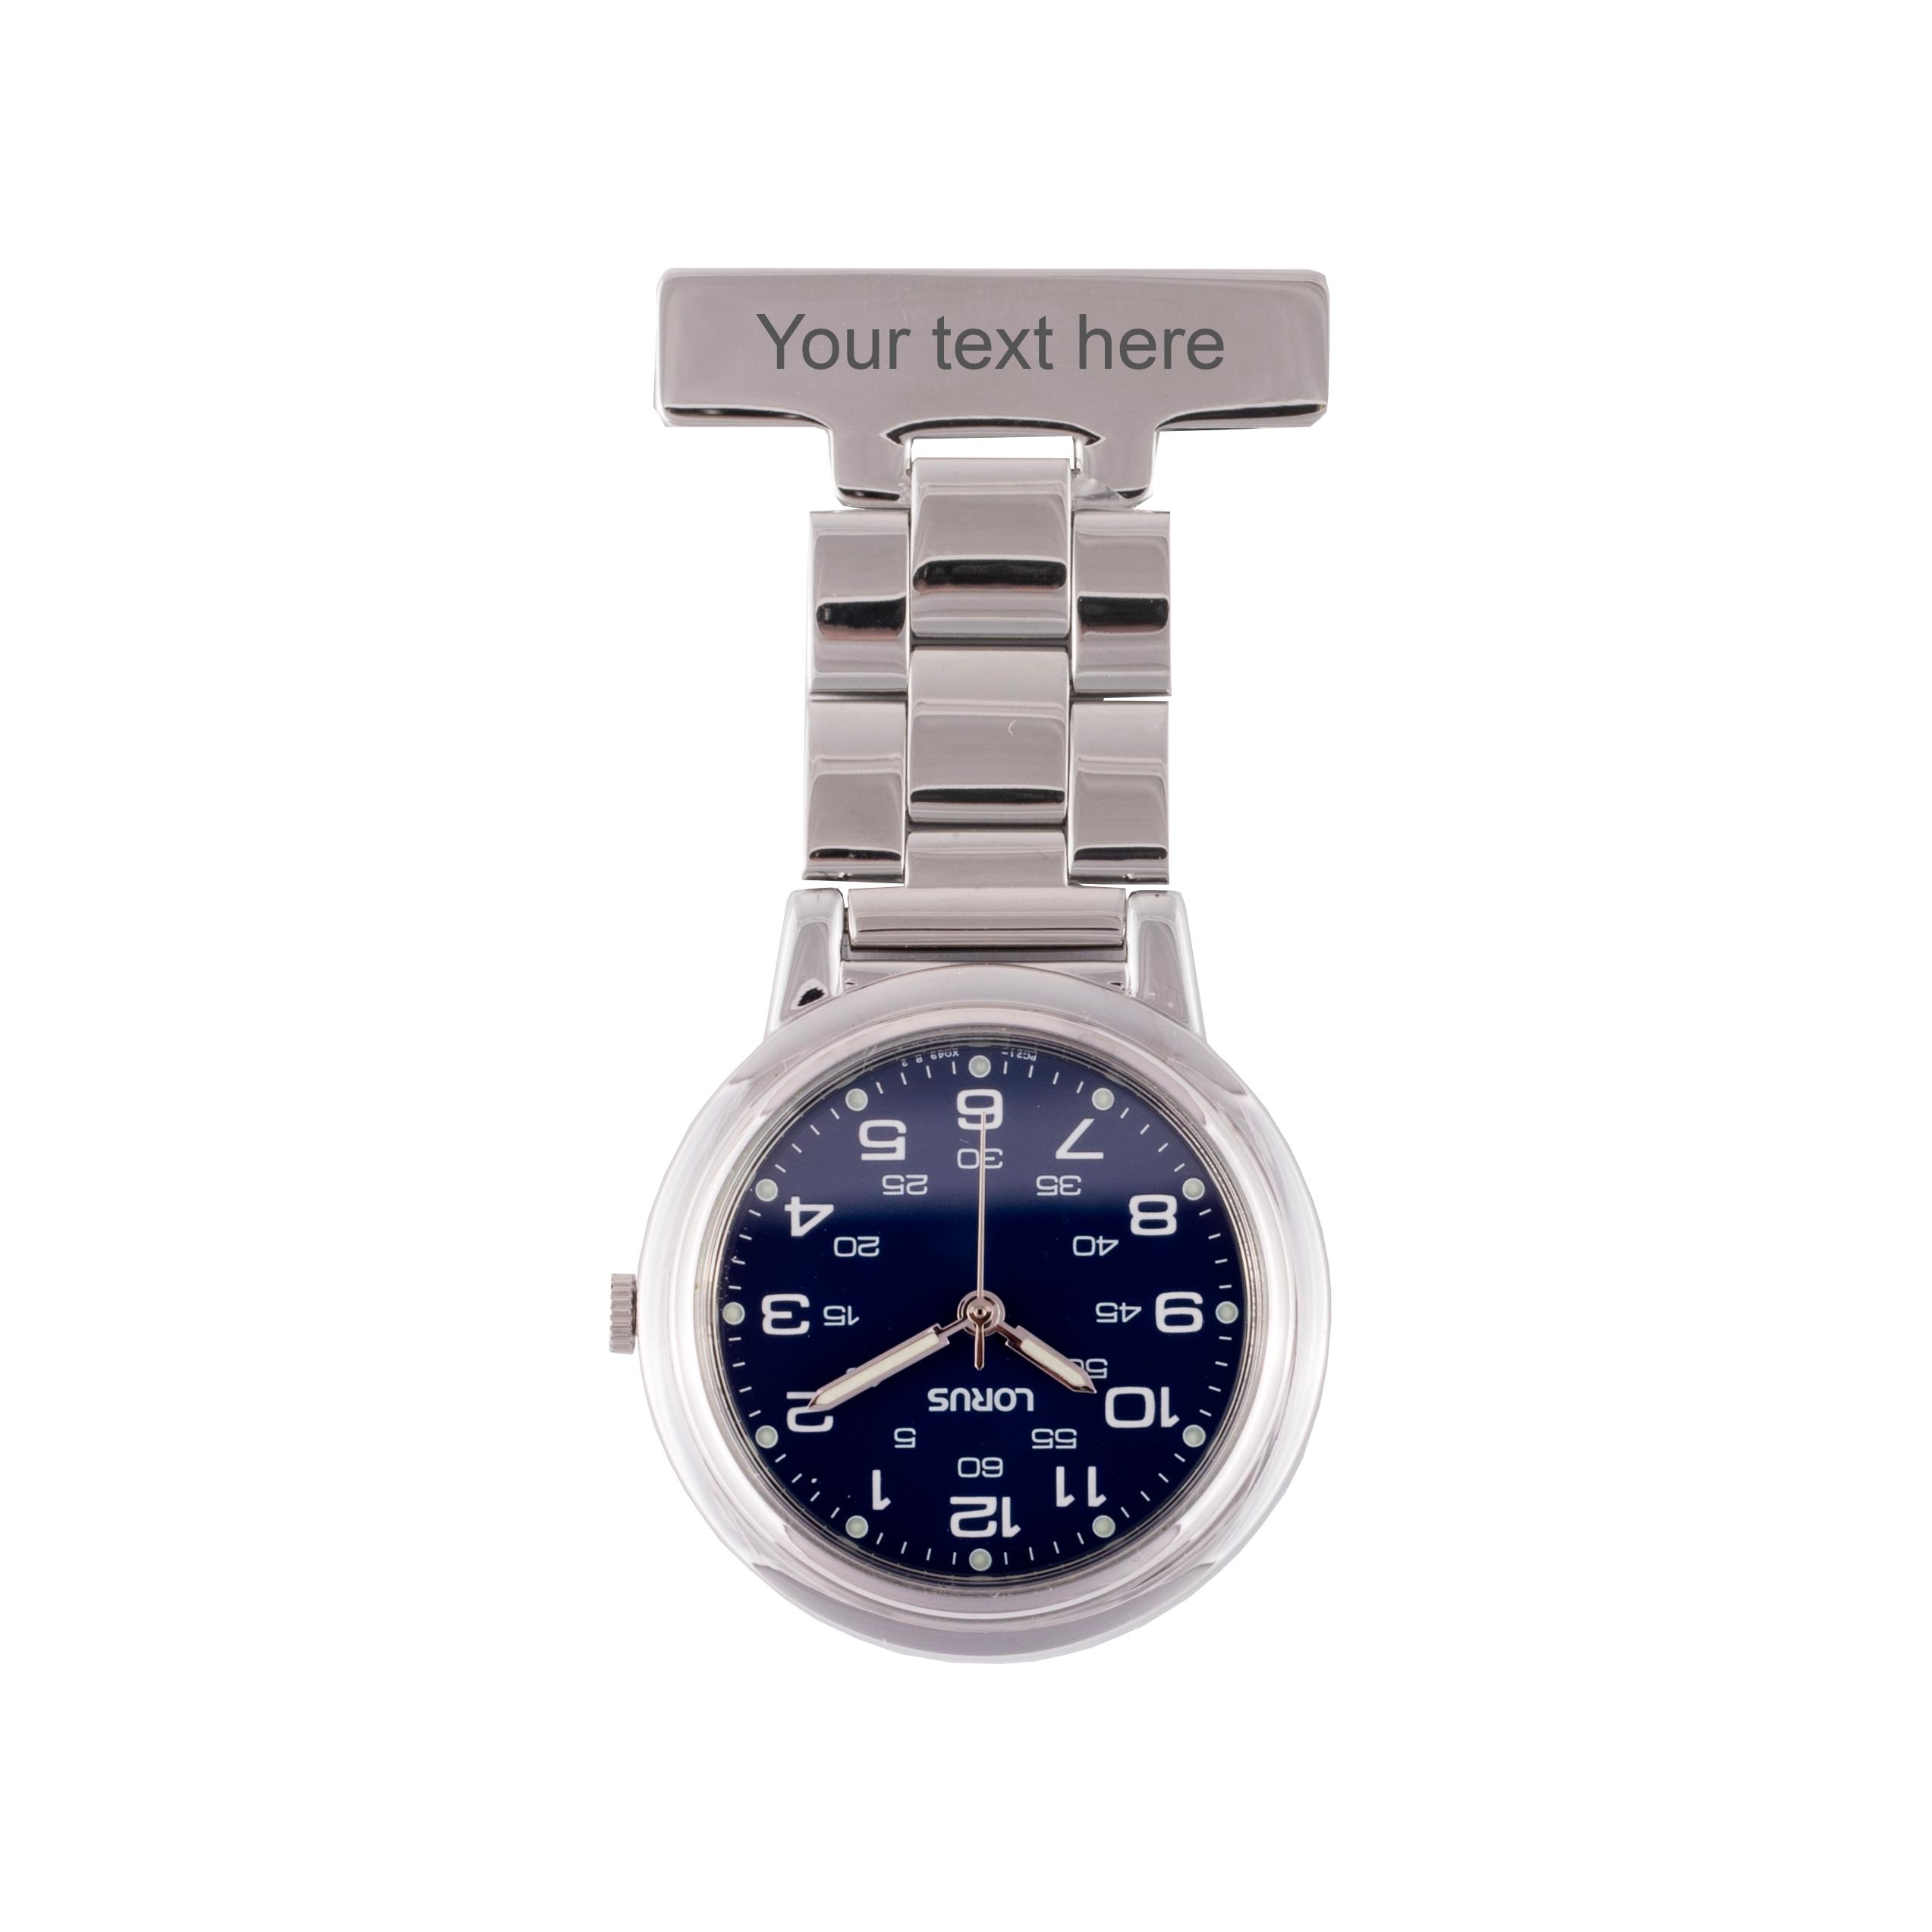 Relojes lorus para enfermeras